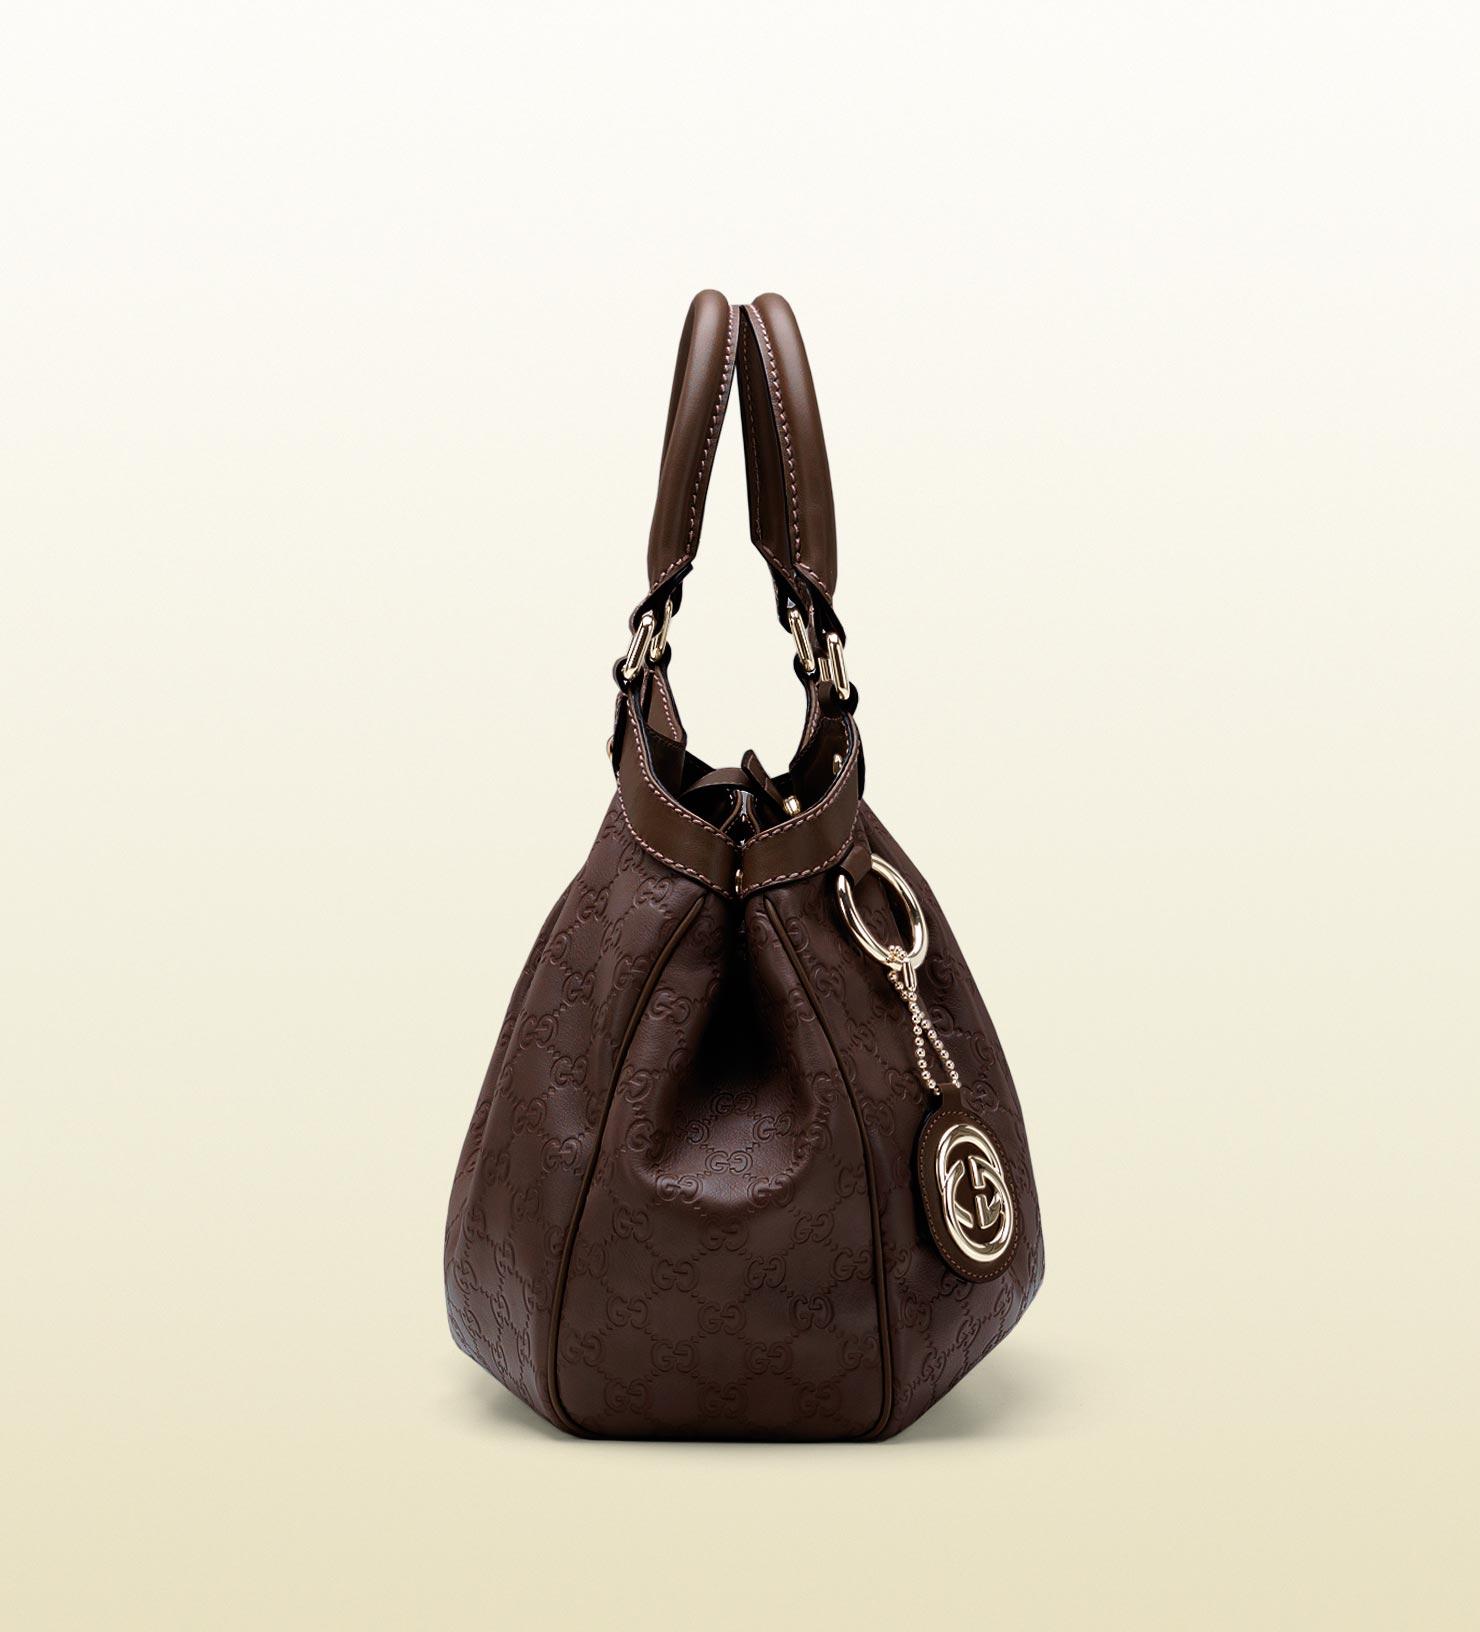 3c8a7c65730 Lyst - Gucci Sukey Medium Ssima Leather Tote in Brown